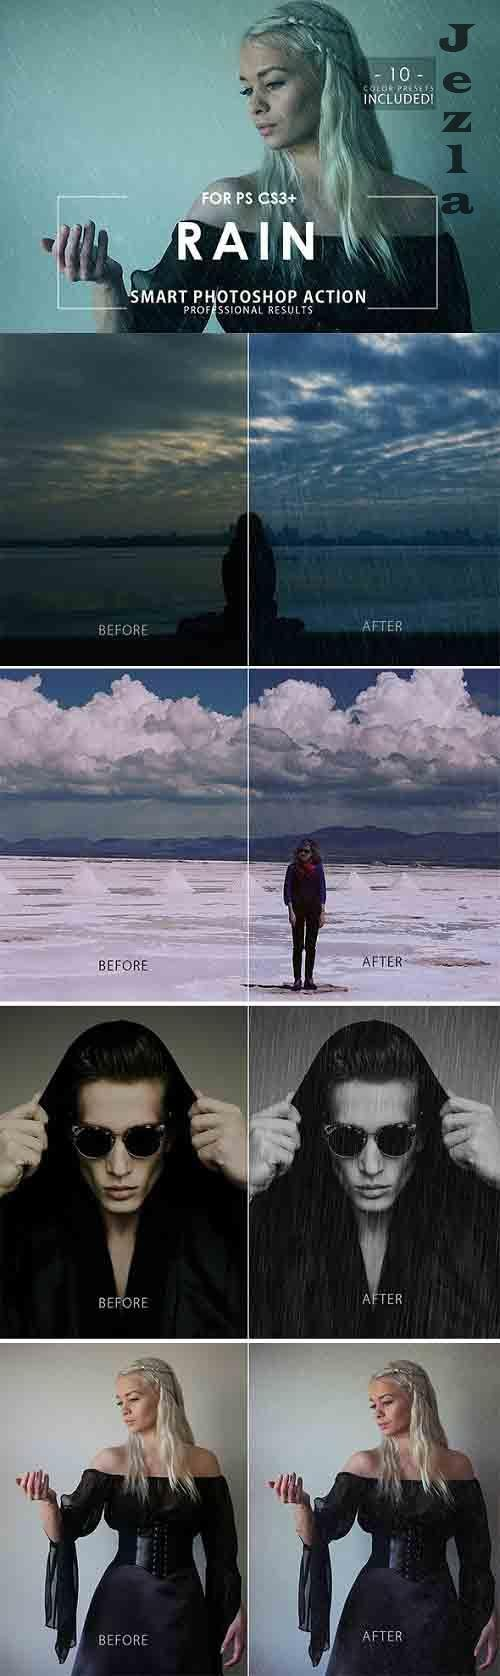 GraphicRiver - Rain Photoshop Action 28806032